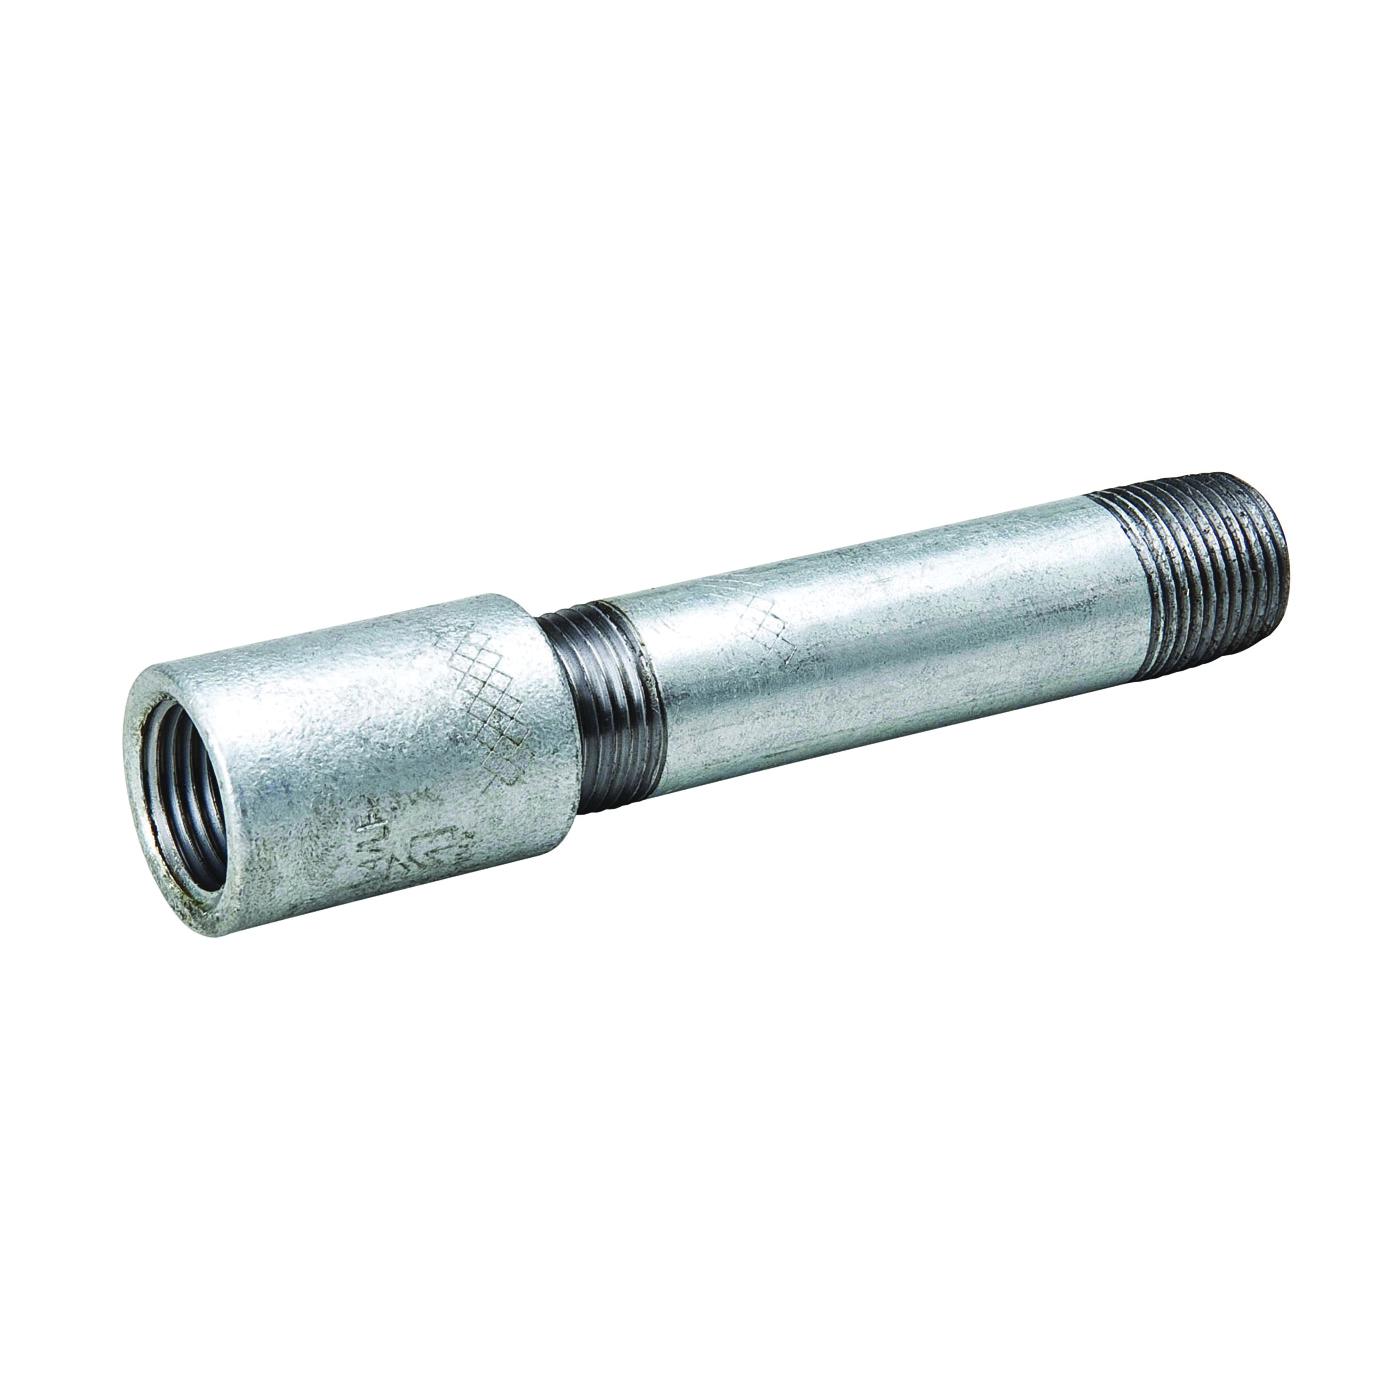 Picture of B & K 564-540HN Pipe Nipple, 3/4 in, Threaded, Galvanized Steel, 150 psi Pressure, 4 in L